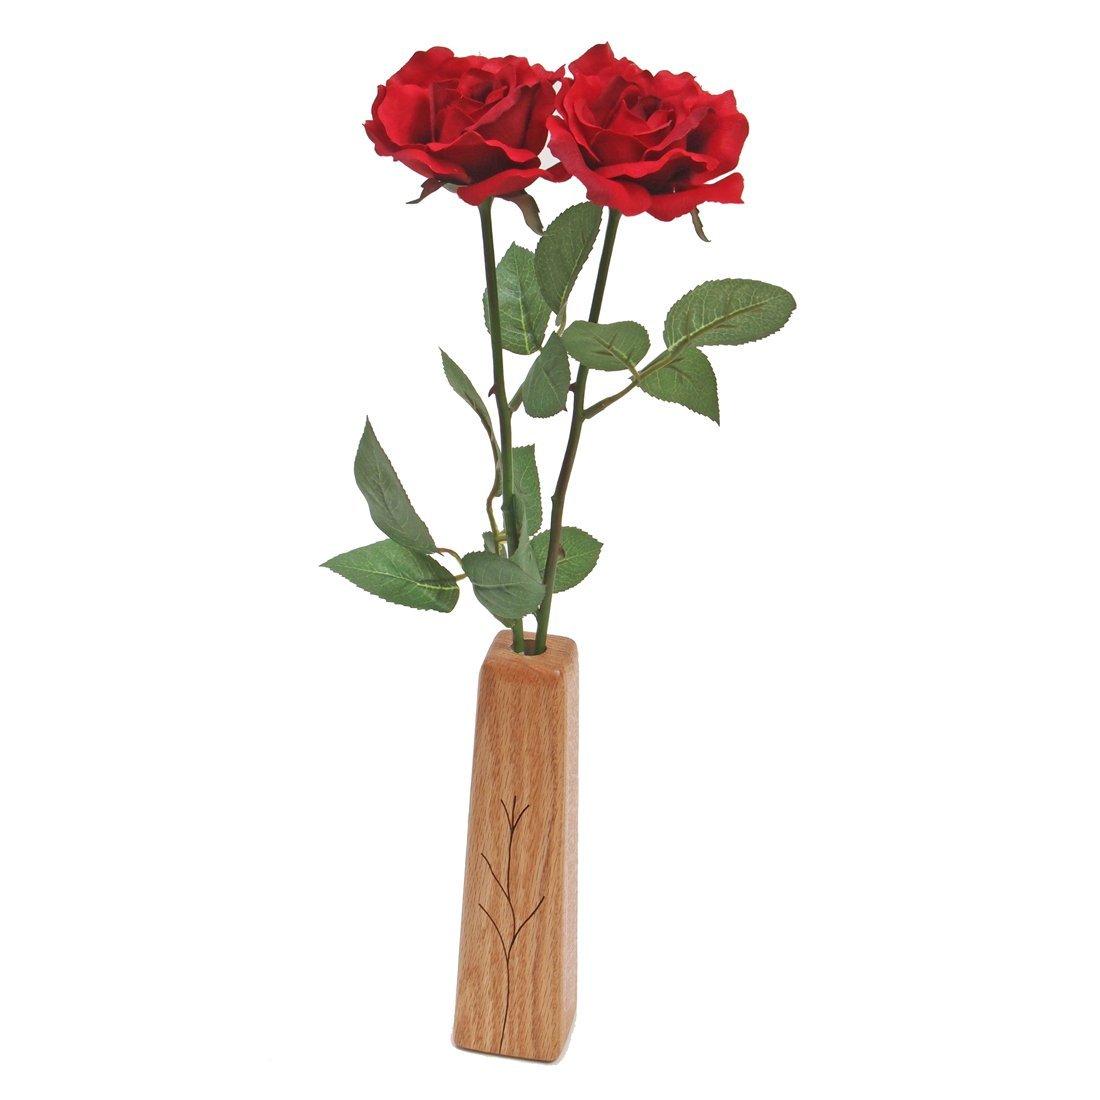 Buy Justpaperroses Silk Roses 12th Wedding Anniversary Gift 2